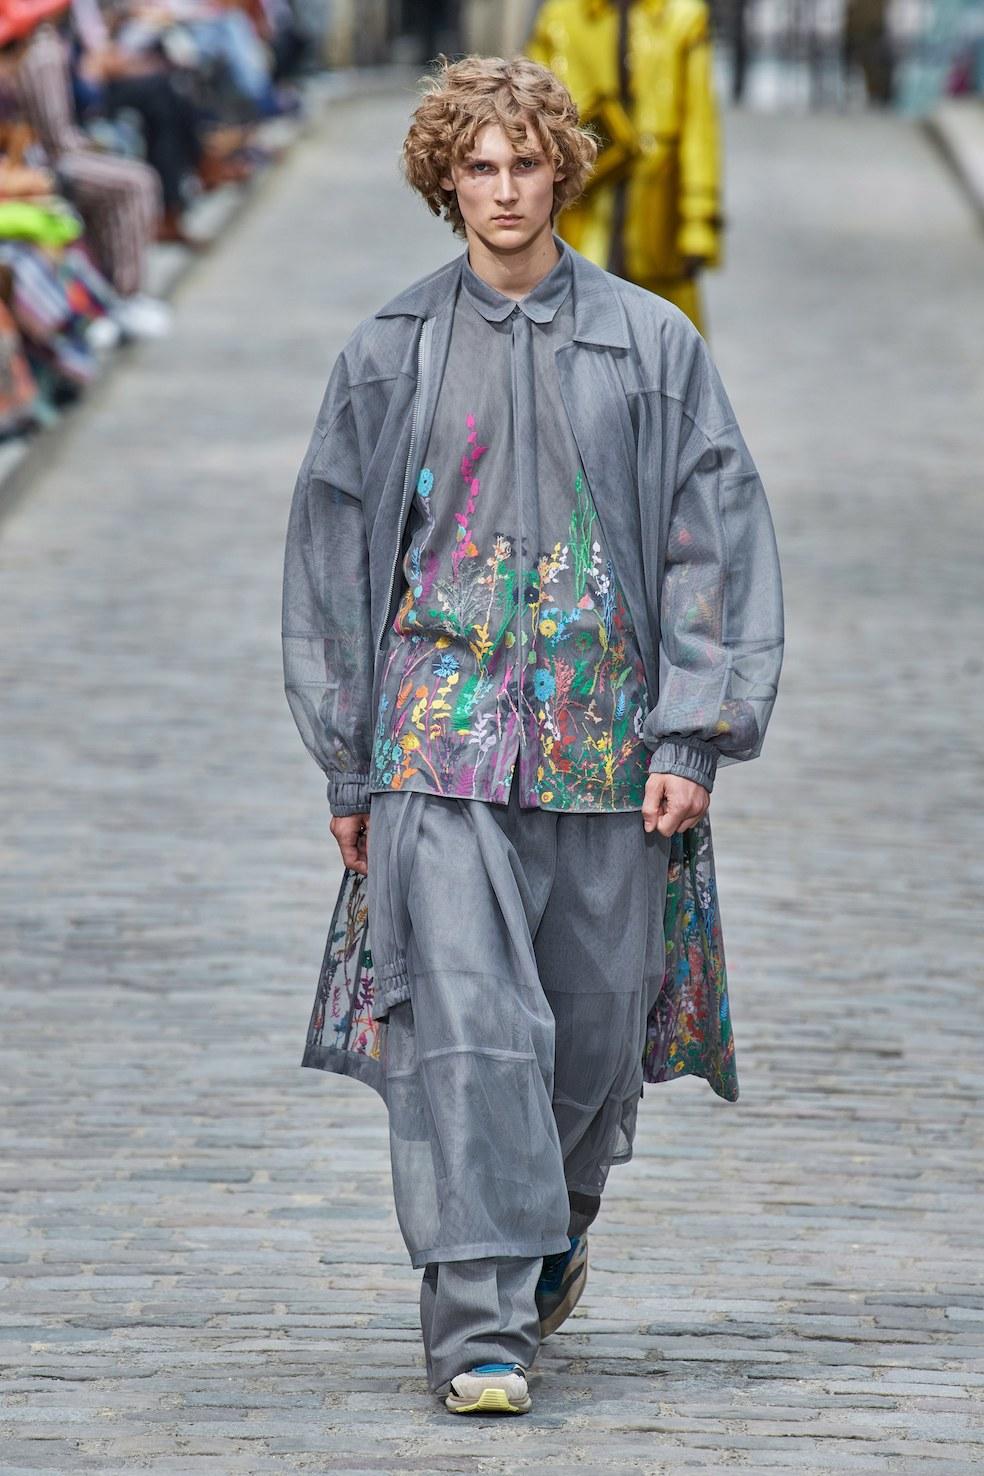 Louis_Vuitton_SS20_Behind_The_Blinds_Magazine__FIO0370.jpg